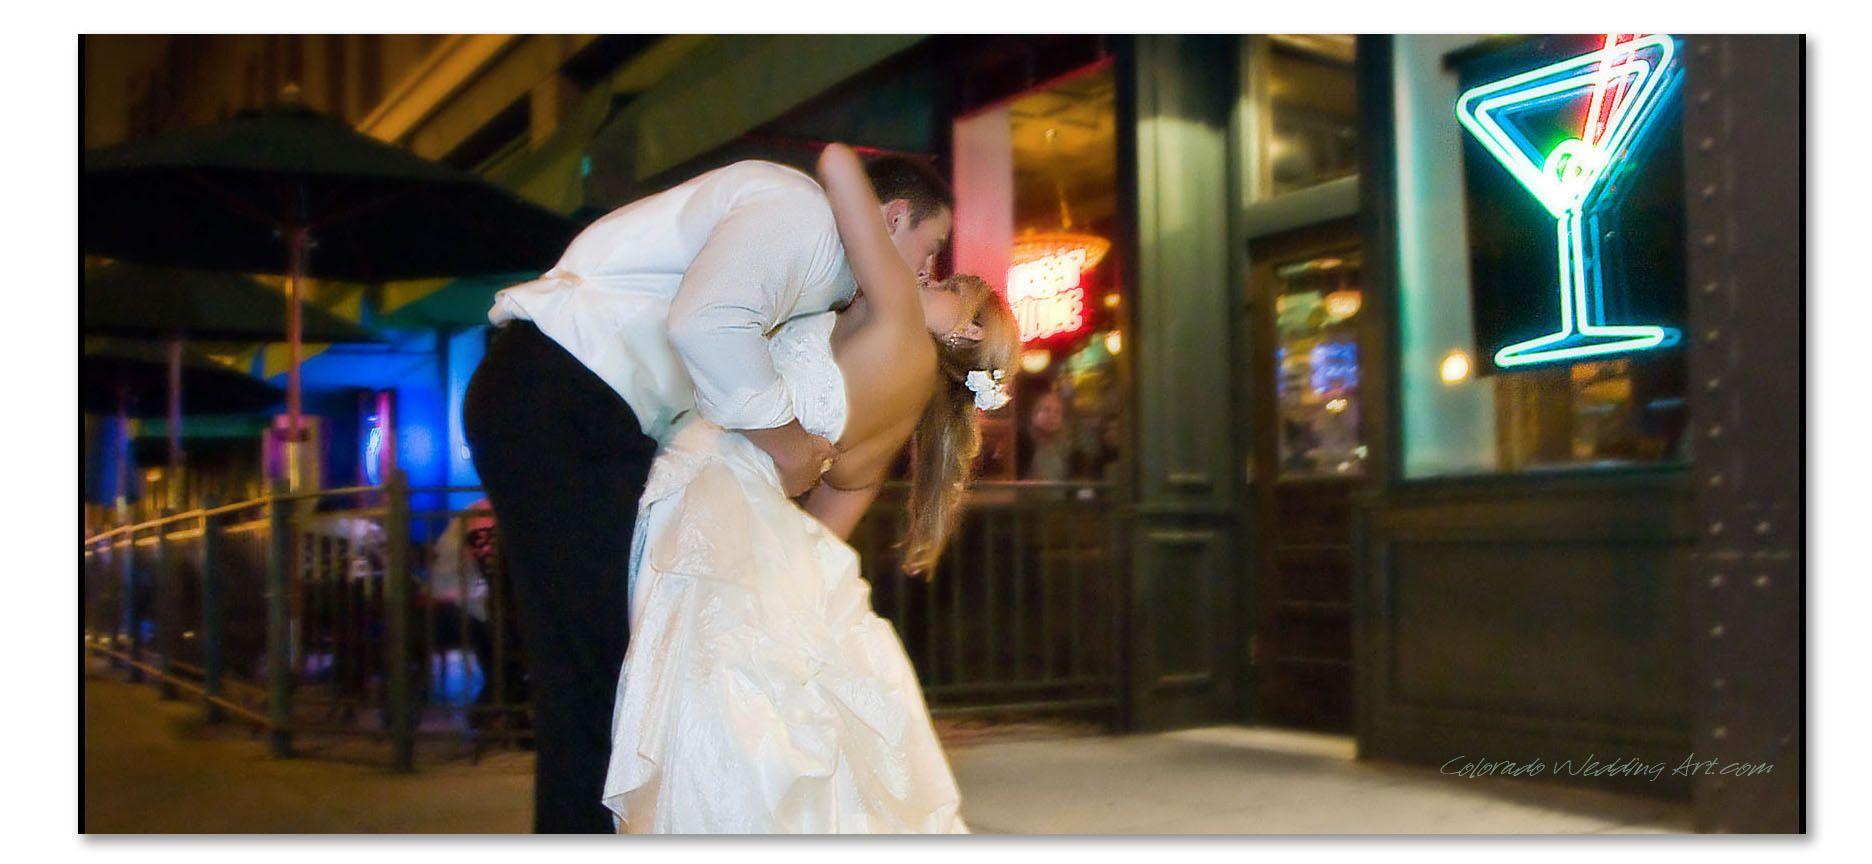 1wedding_street_photography_colorado